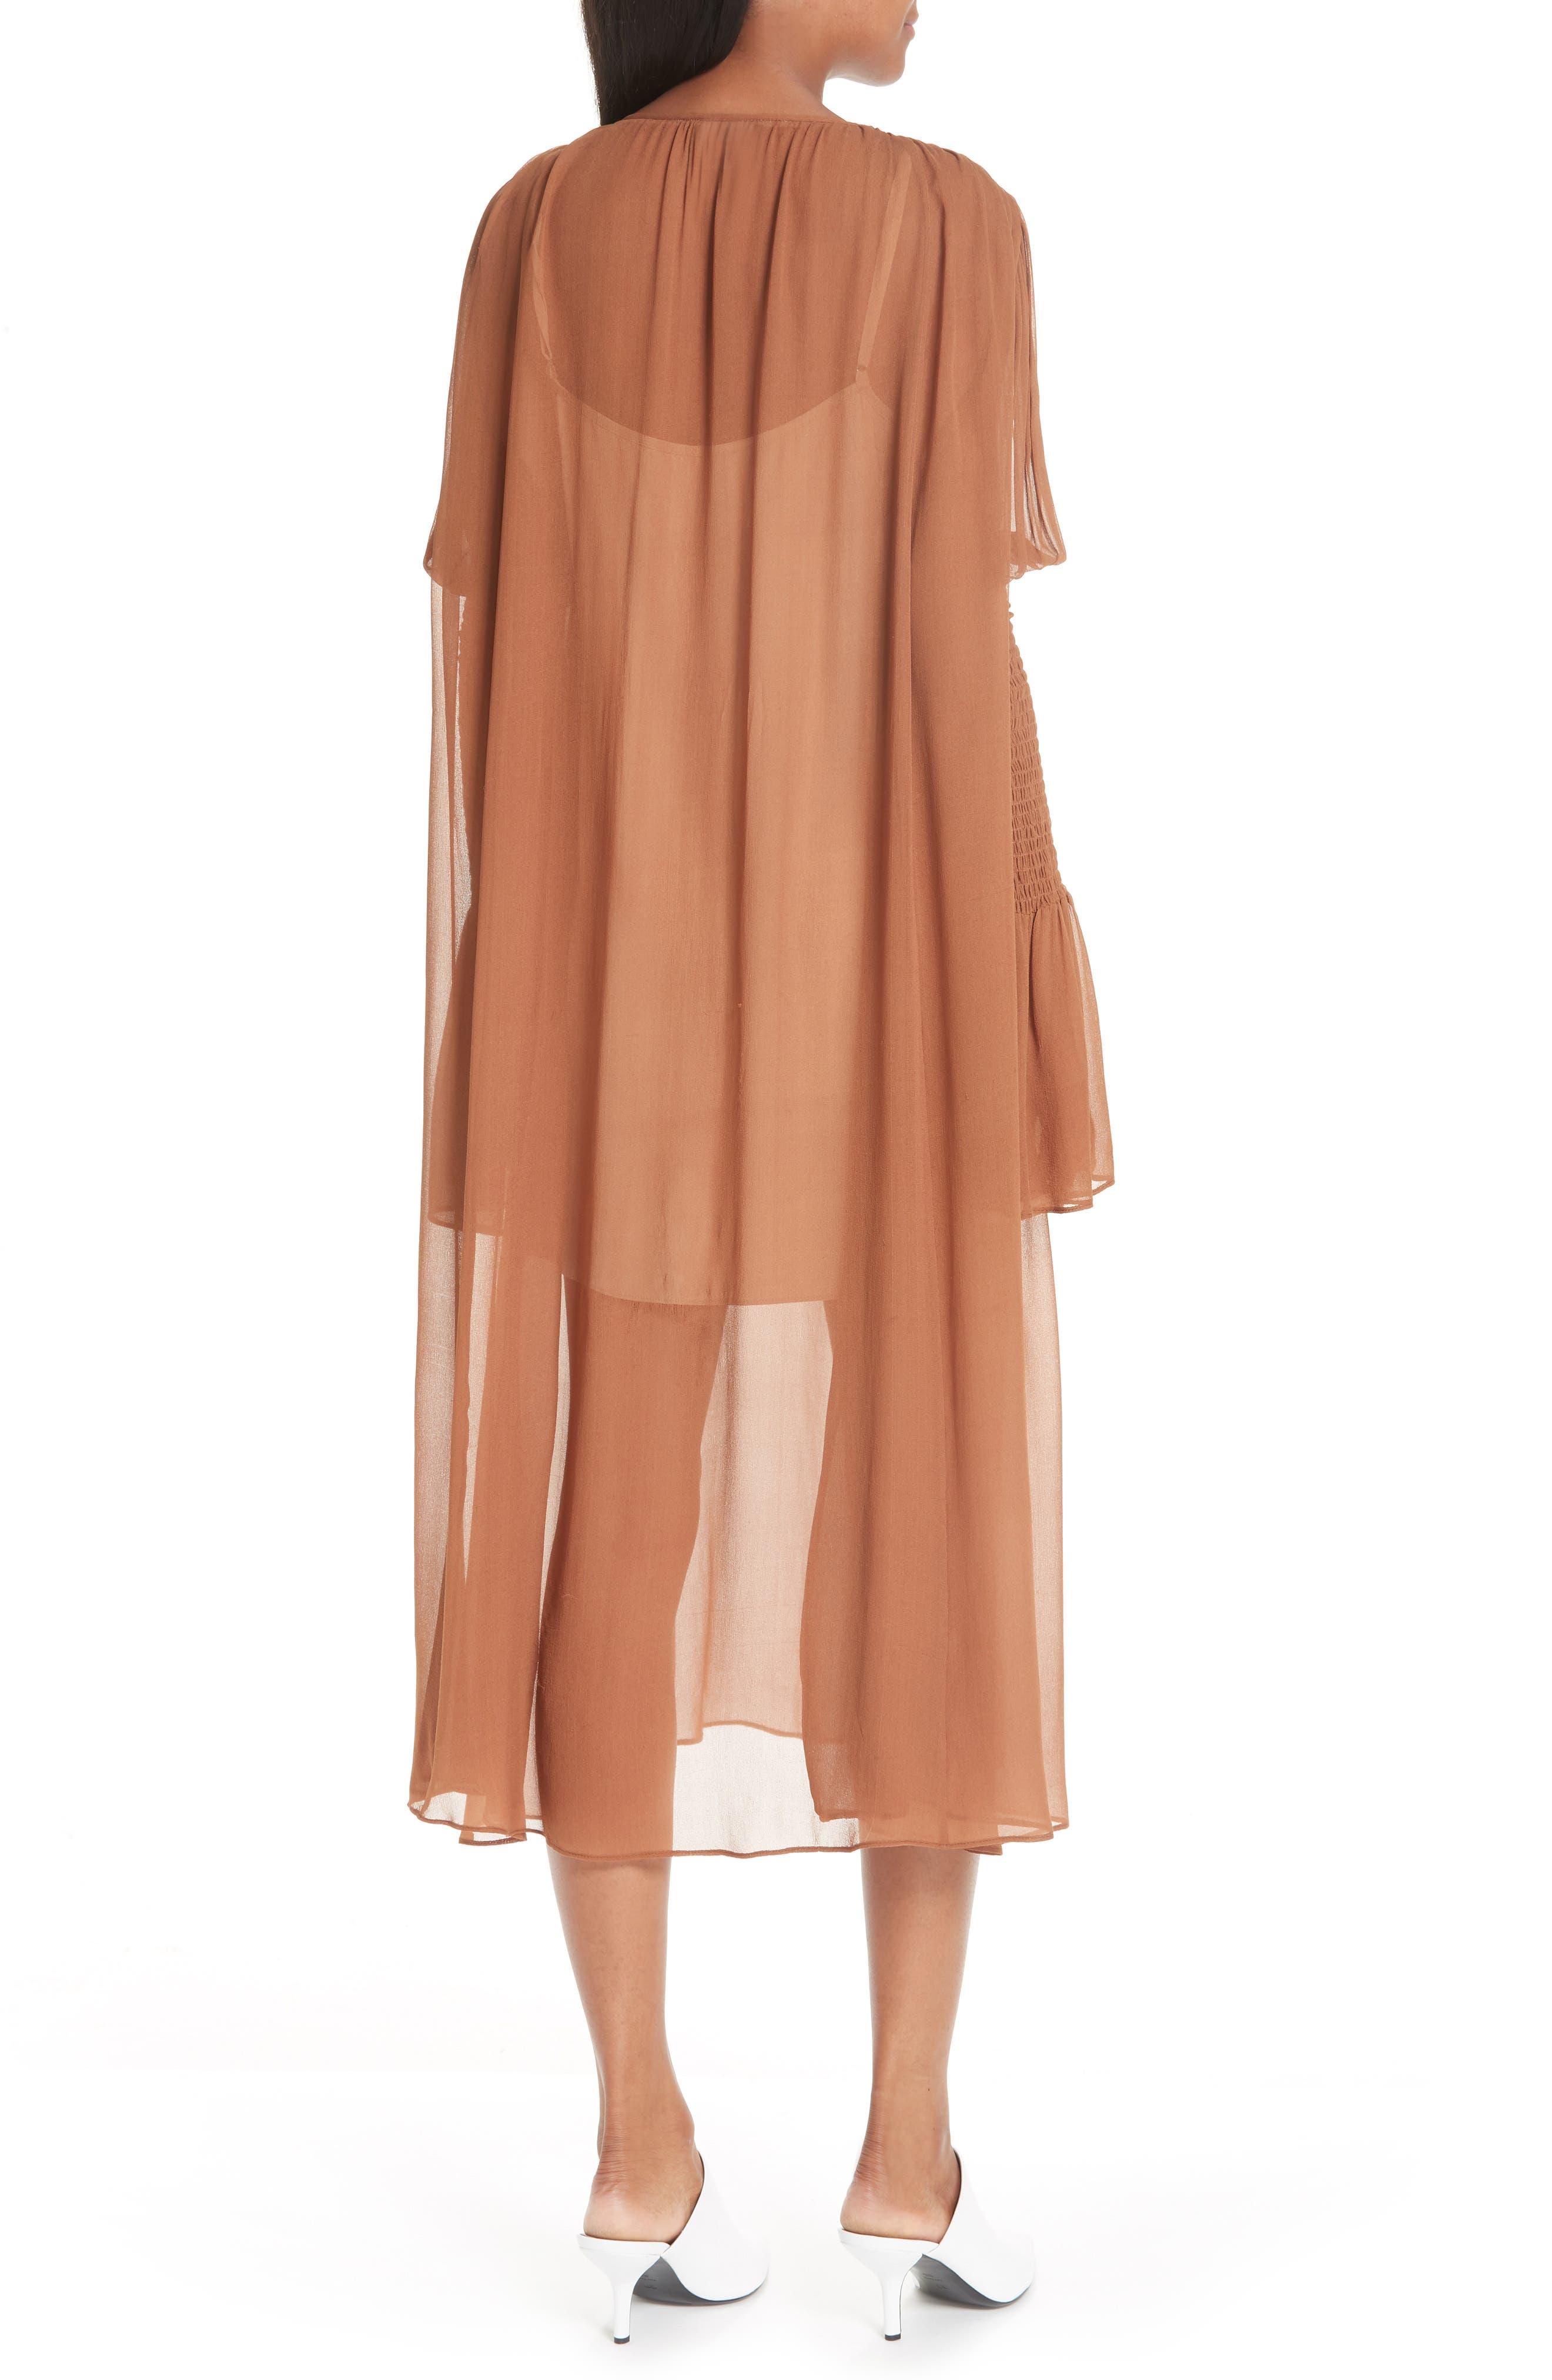 CIENNE,                             The Costa Silk Dress,                             Alternate thumbnail 2, color,                             200